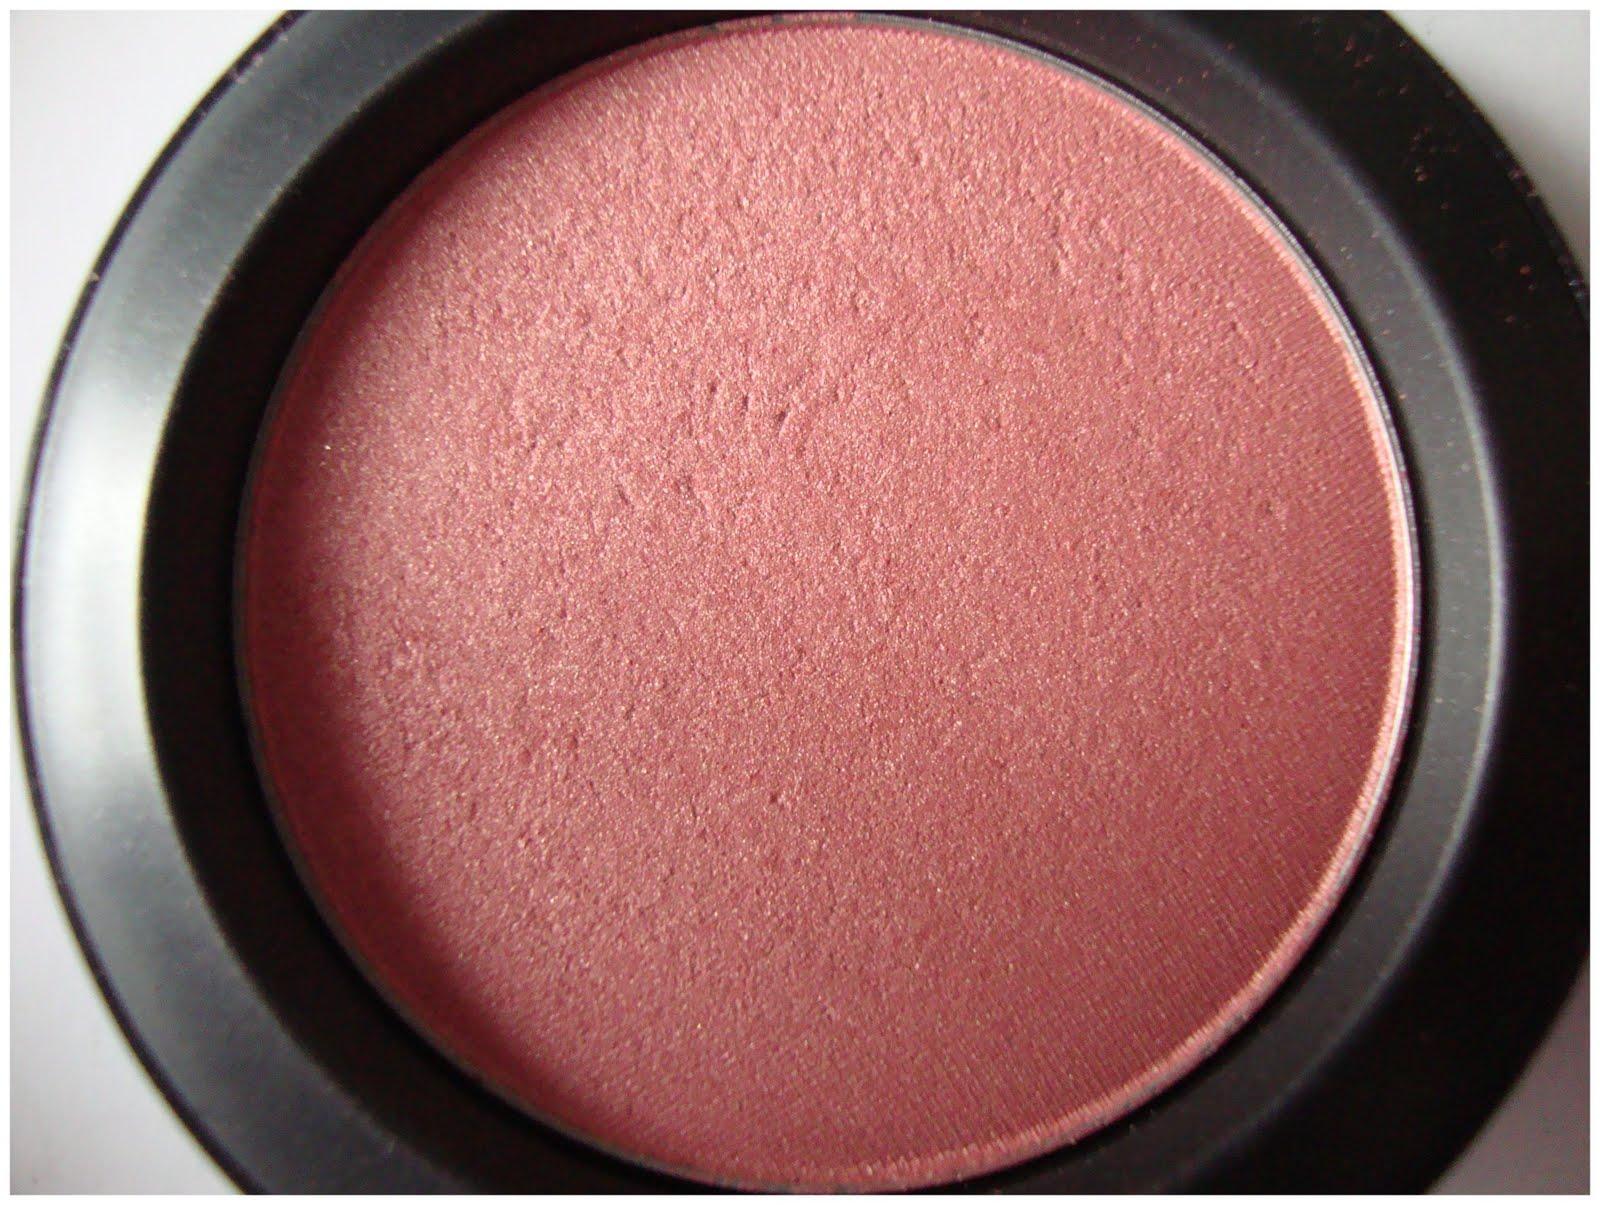 Keen on MAC Peachykeen blush : Swatches, Review, Photos ...